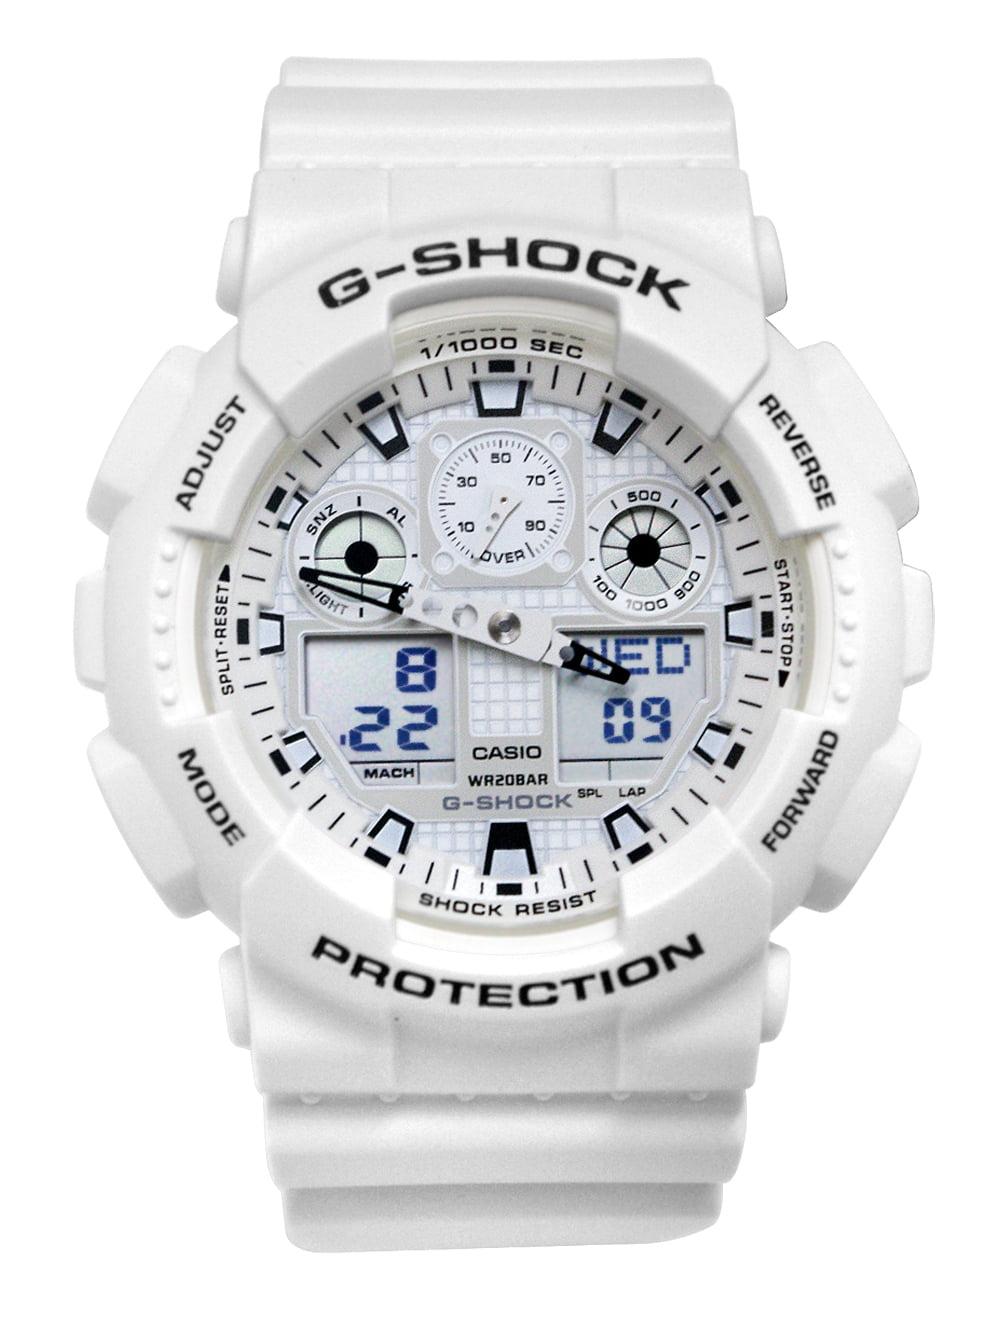 Casio GA100MW-7A G-Shock Analog Digital Dial White Resin Band Watch NEW 889232191461, BRC1 - $99